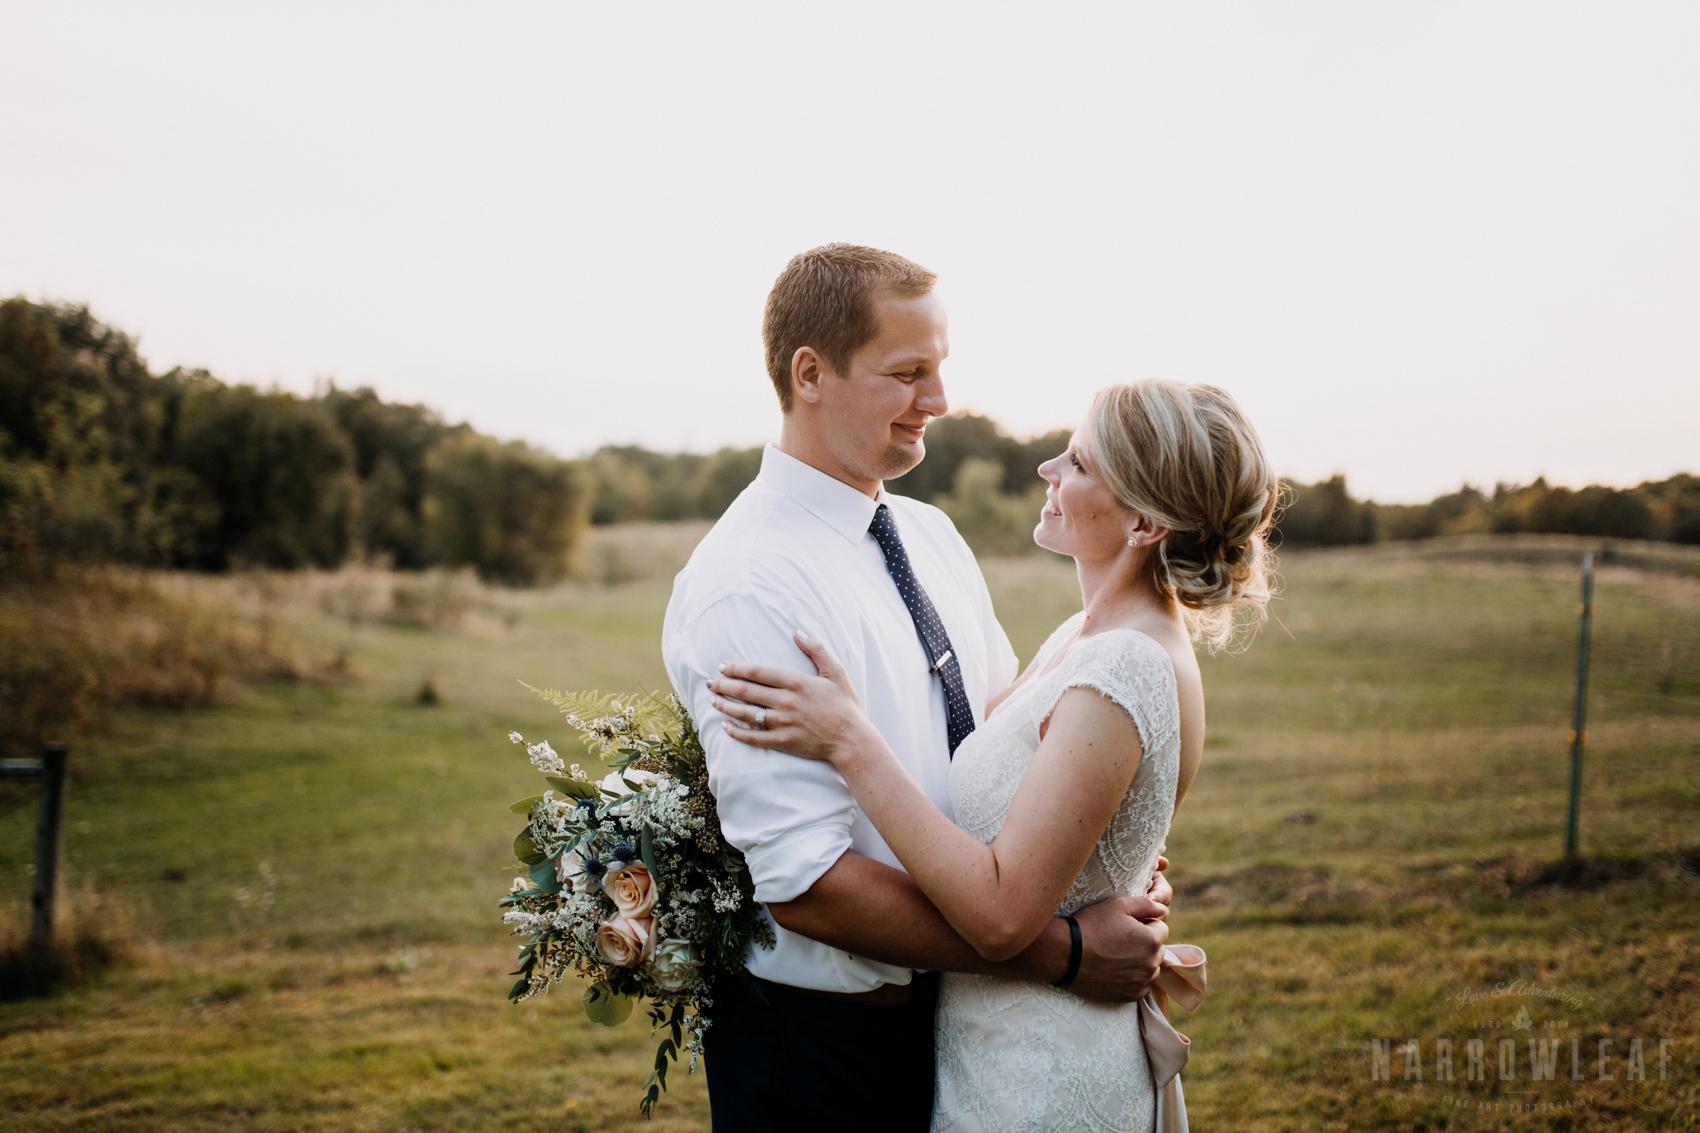 warm-romantic-sunset-bride-groom-photos-on-a-farm-in-south-haven-mn-42.jpg